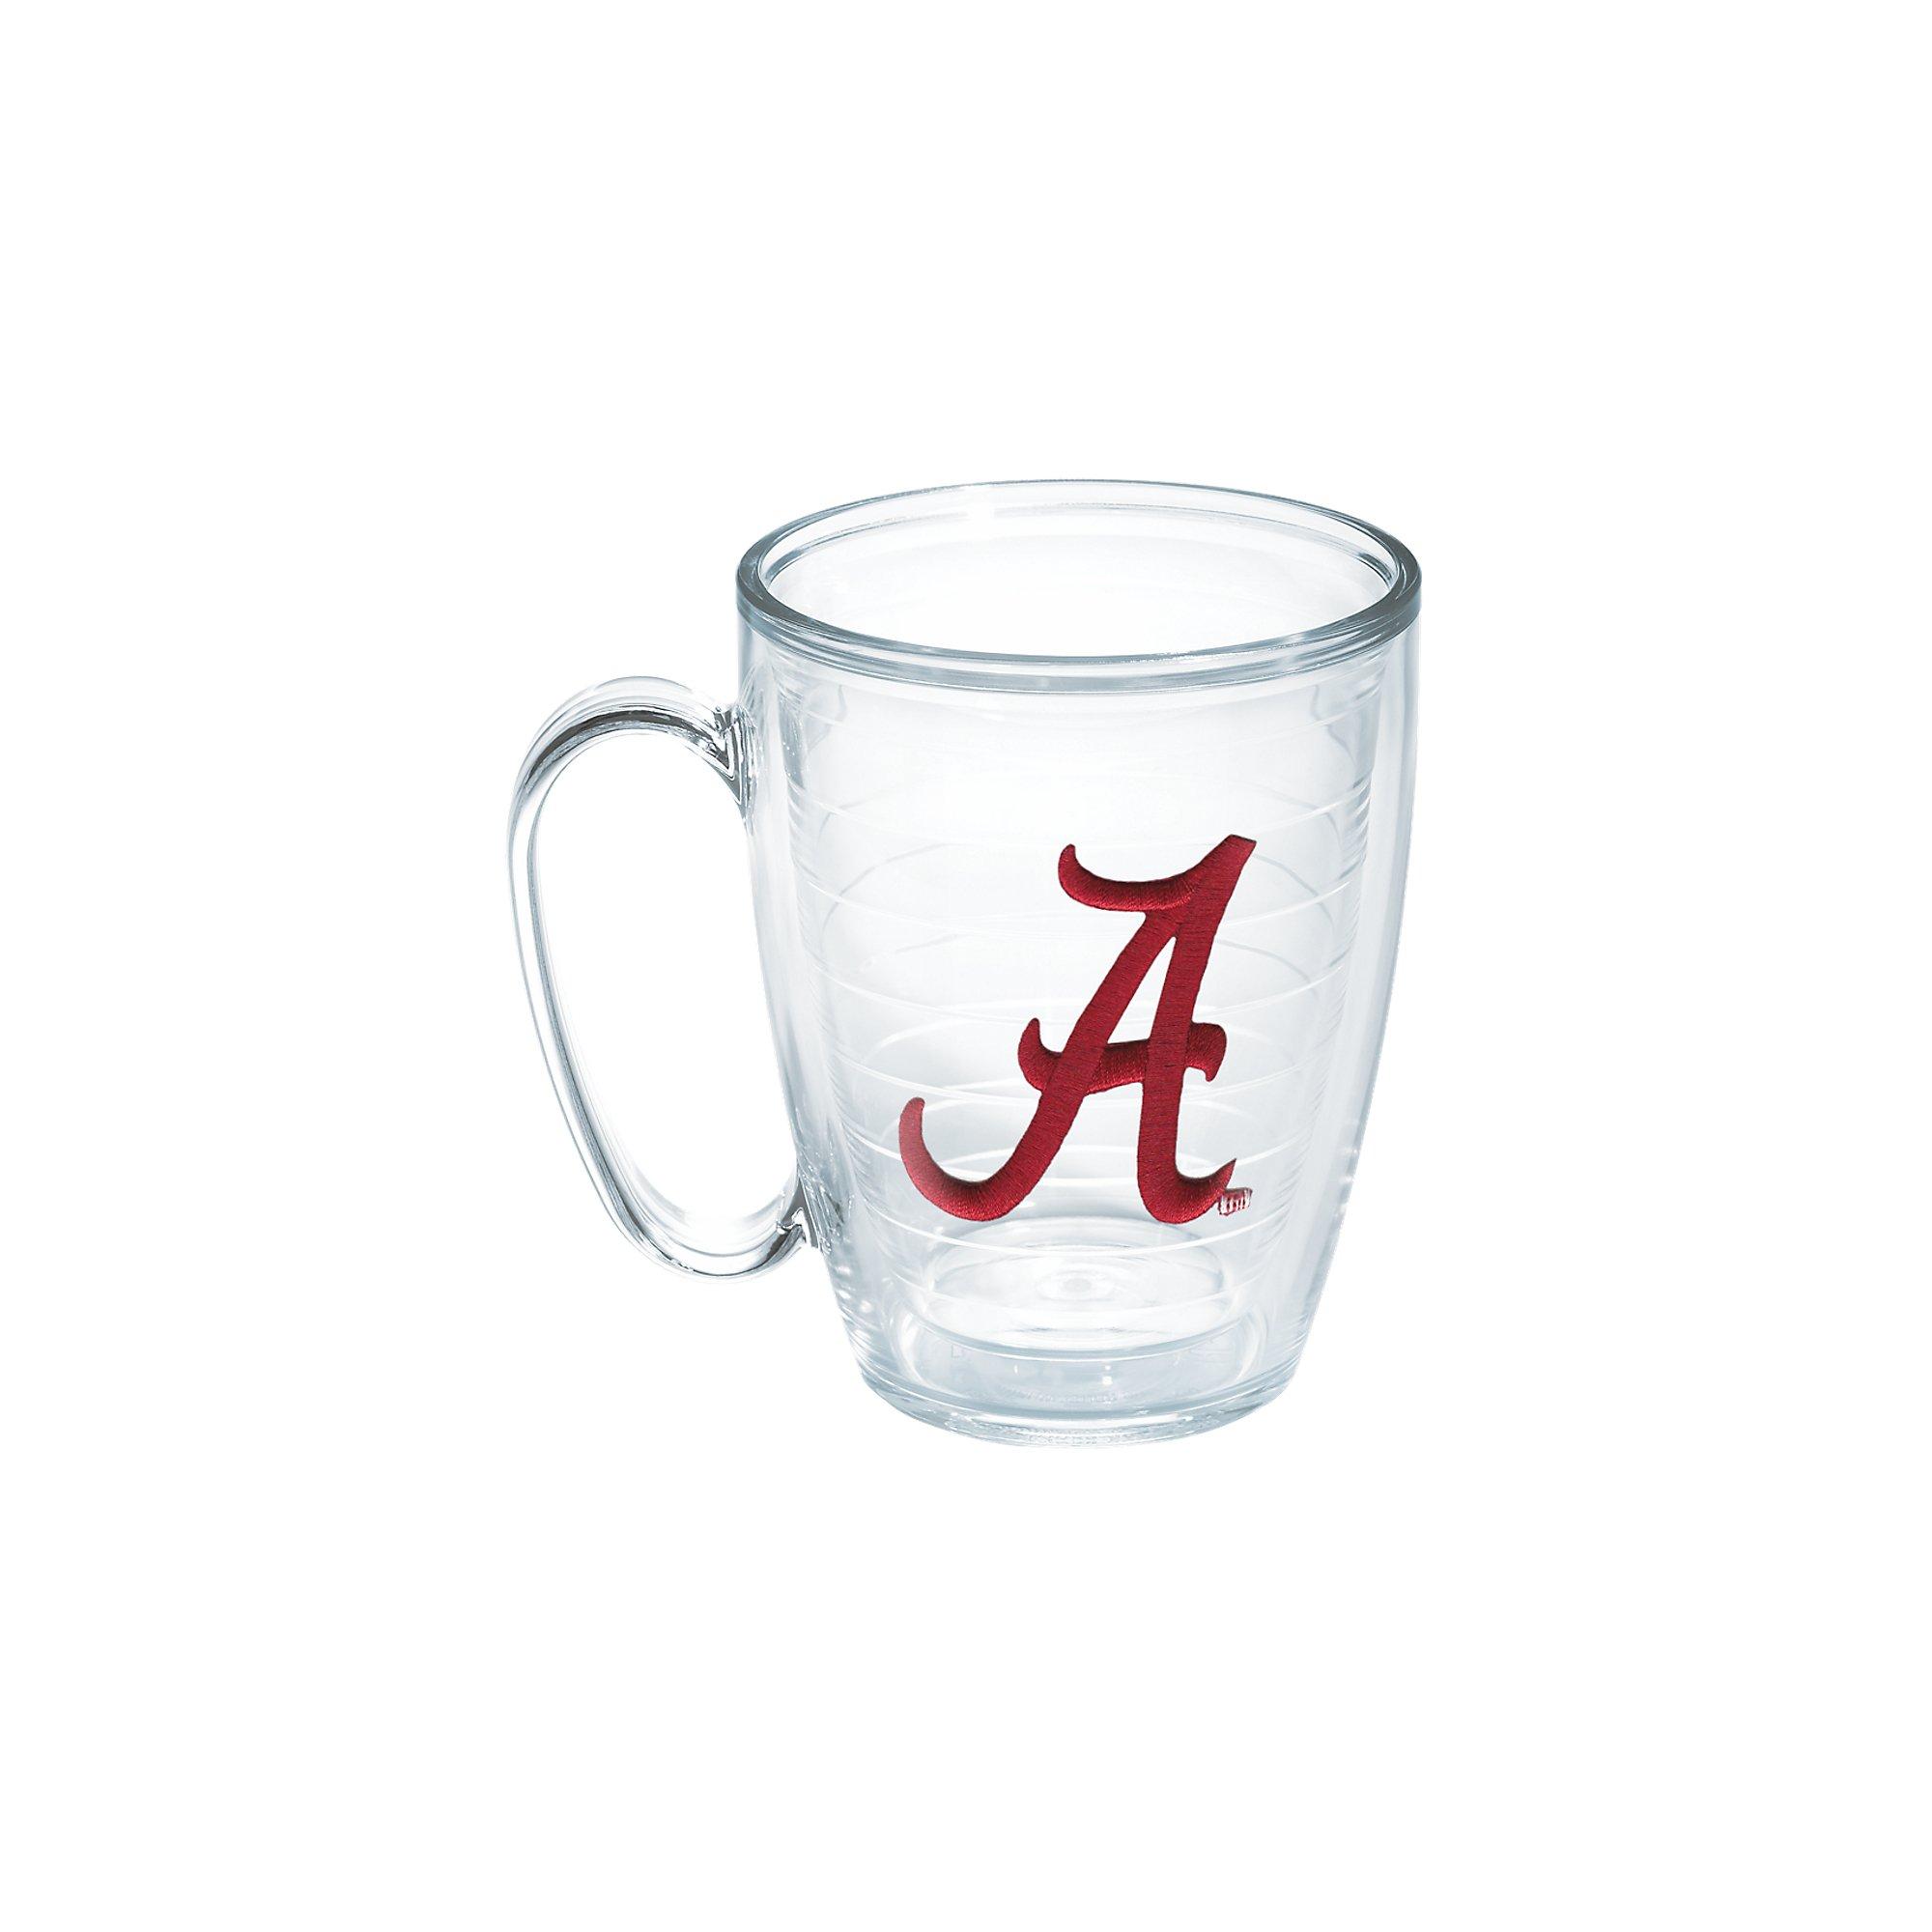 Tervis 1084192 Alabama University Text Emblem Individual Mug, 16 oz, Clear